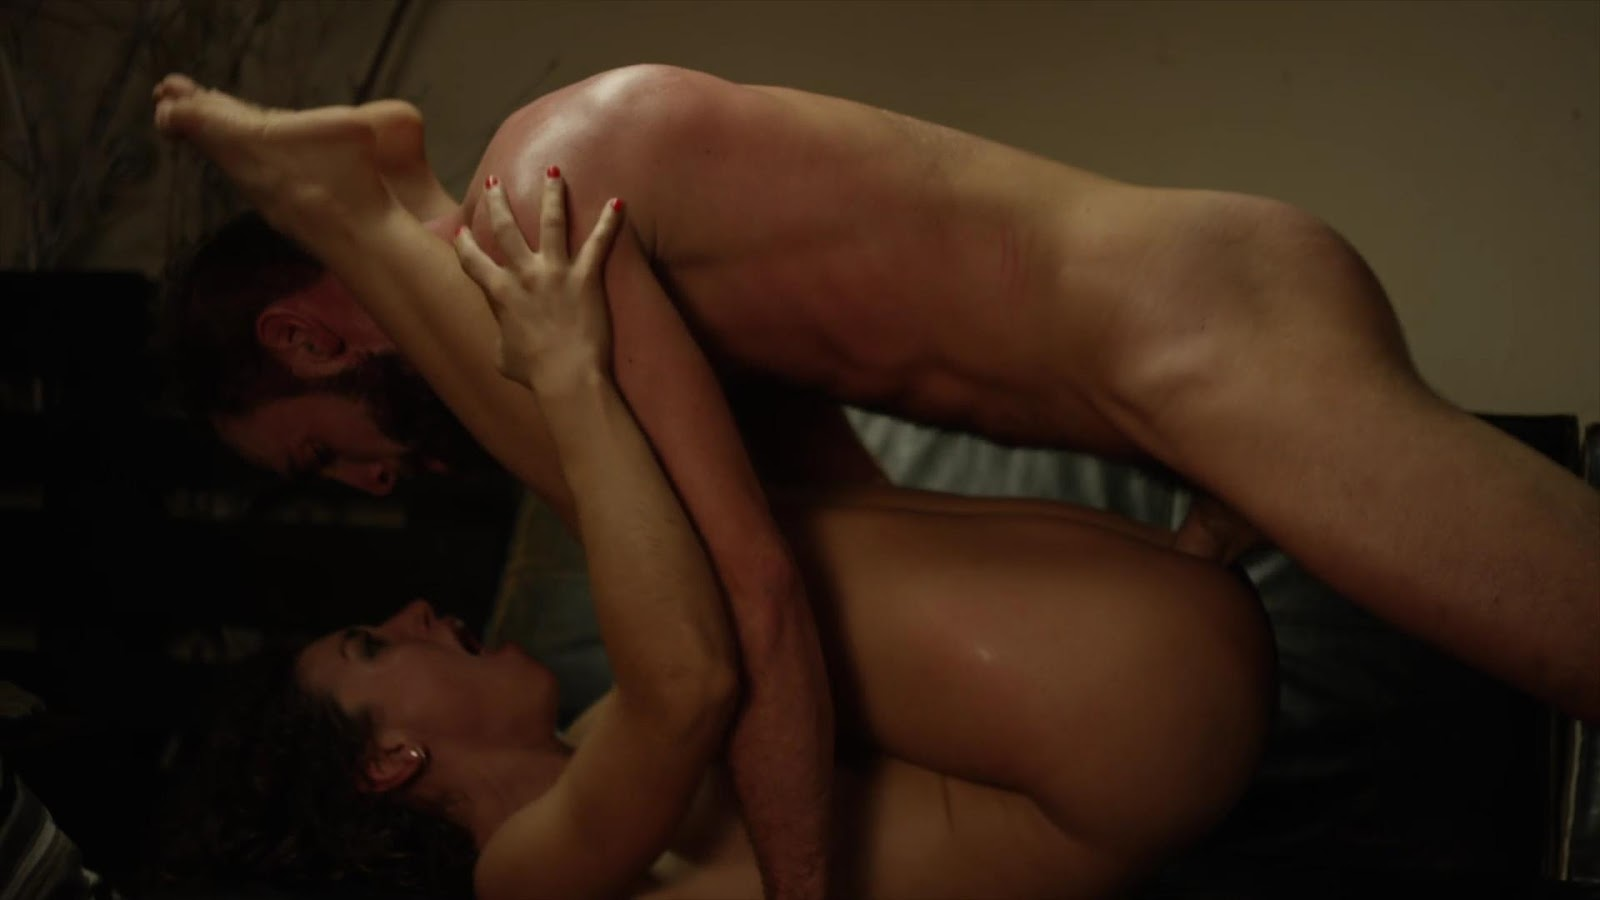 erotic near me